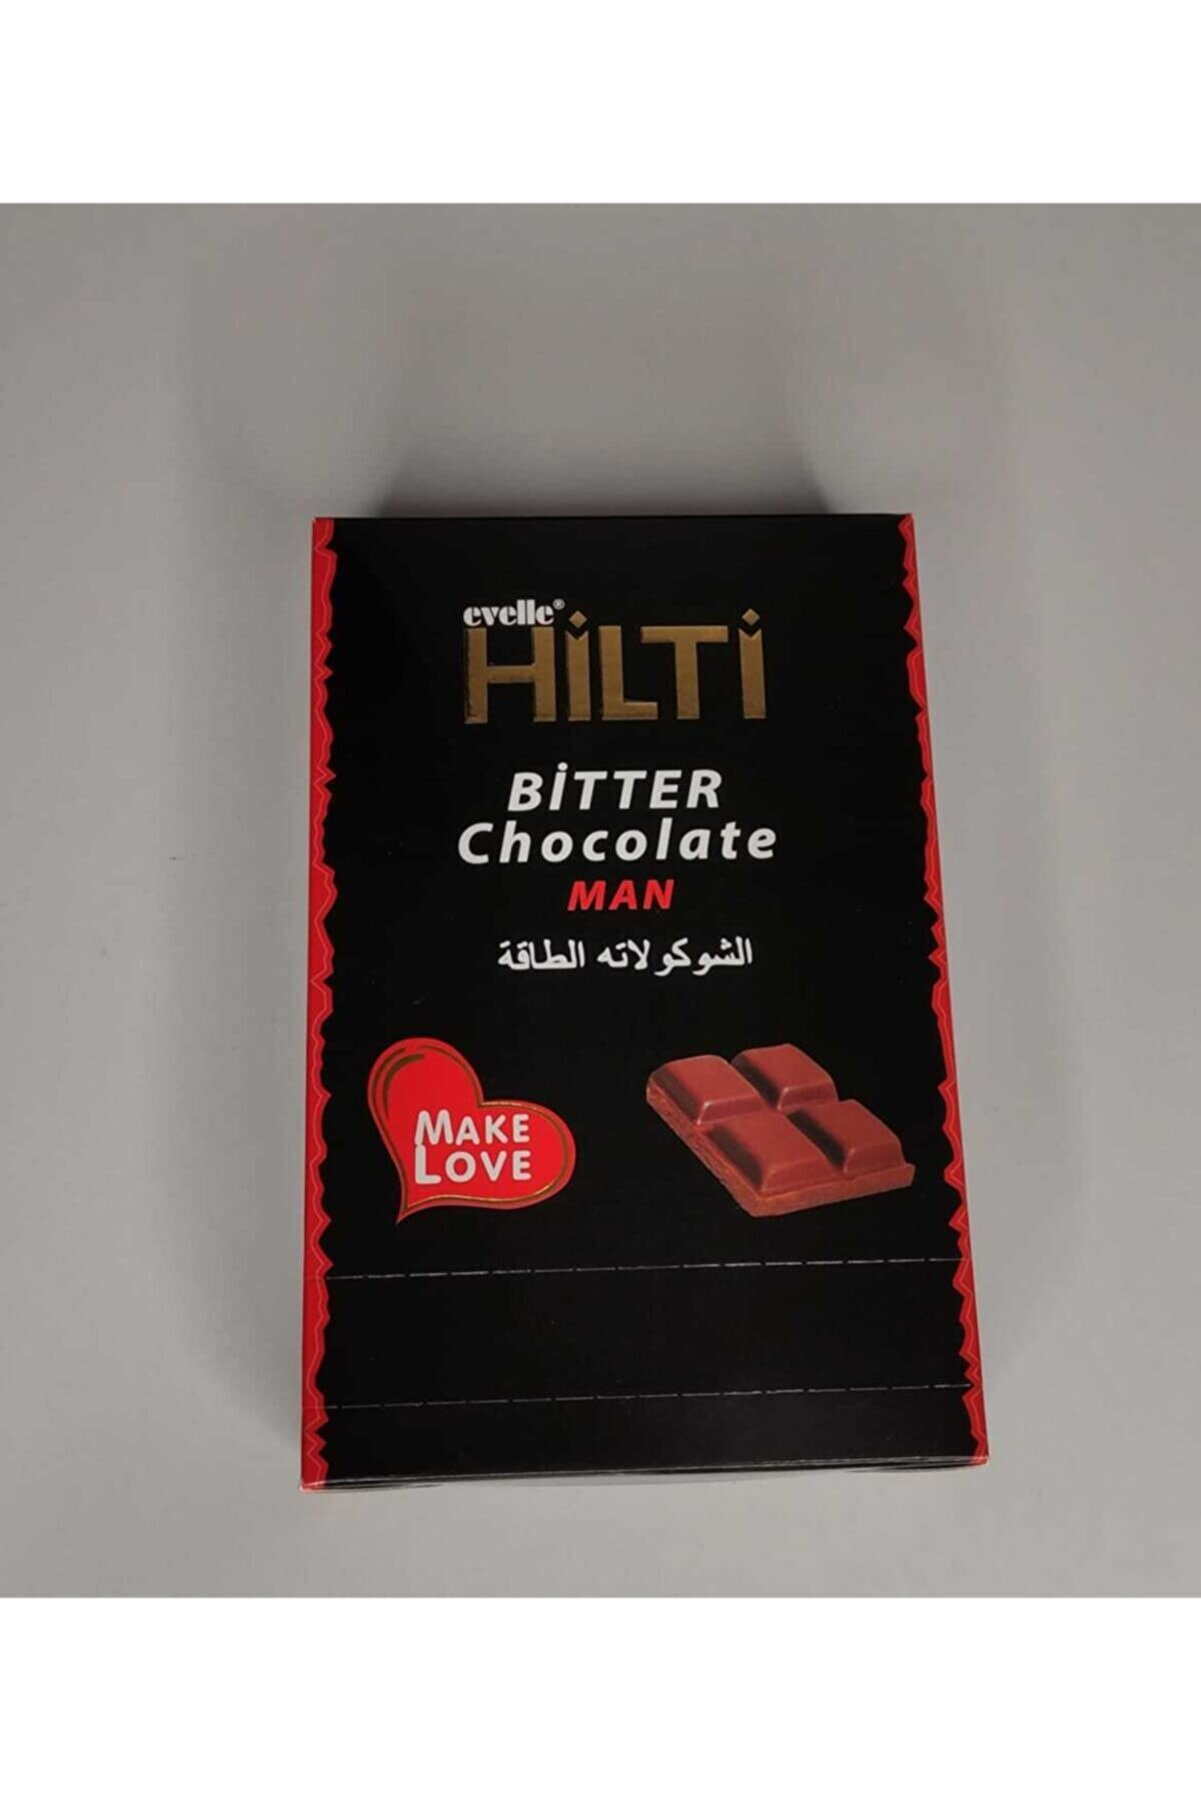 Wonderful Honey Hilti Make Love Erkekler Için Bitkisel Bitter Çikolata   Hiva Bitkisel